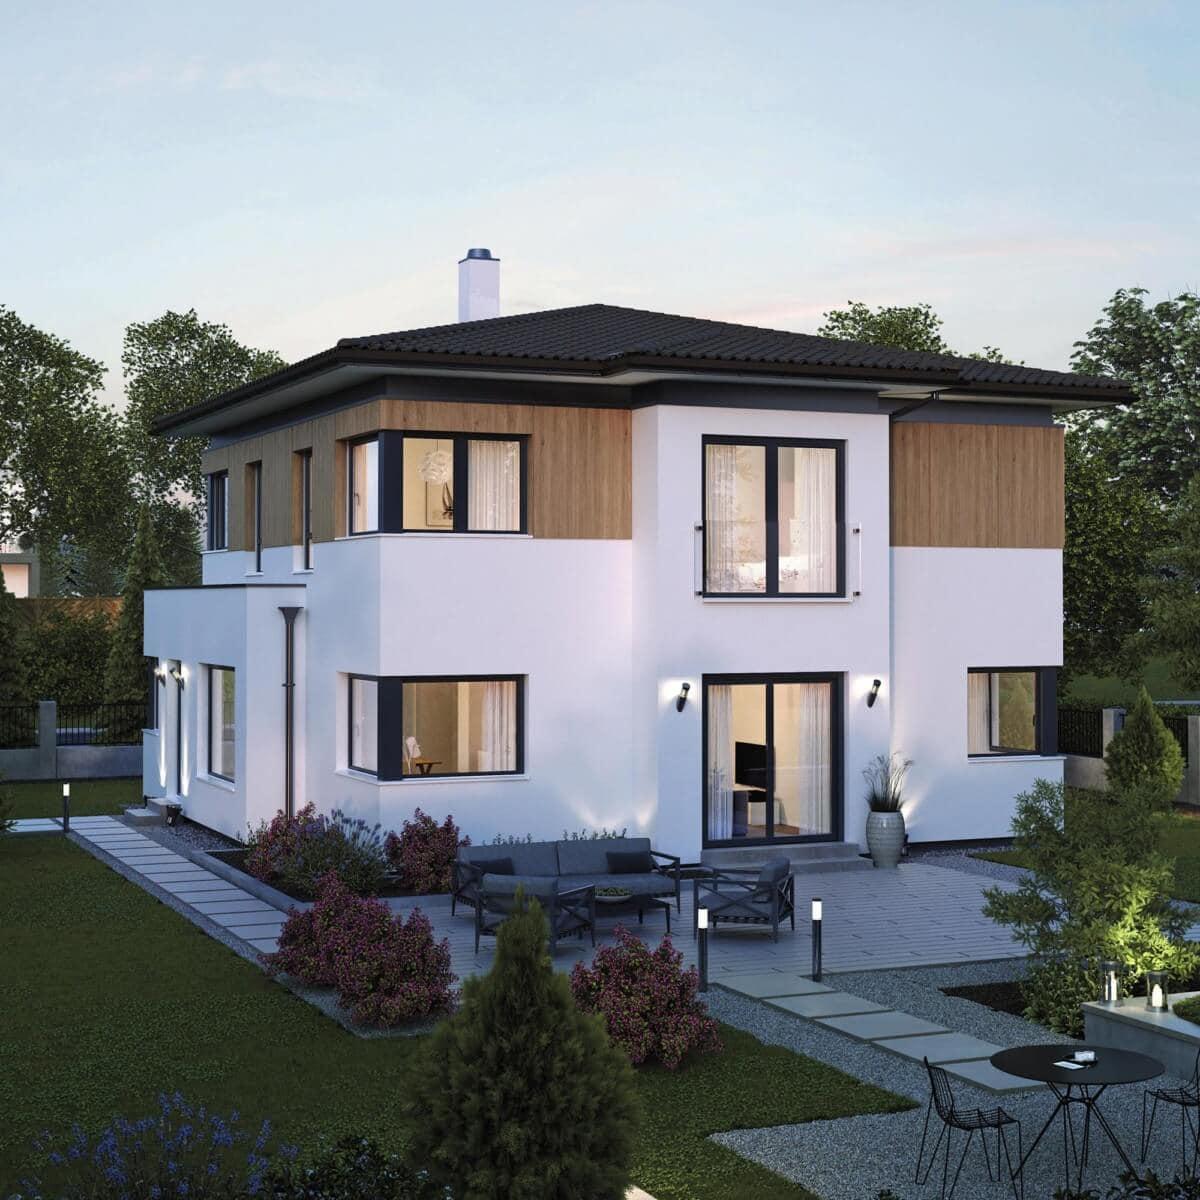 Fertighaus Stadtvilla modern mit Holz Putz Fassade & Walmdach - Einfamilienhaus bauen Ideen ELK Haus 161 - HausbauDirekt.de